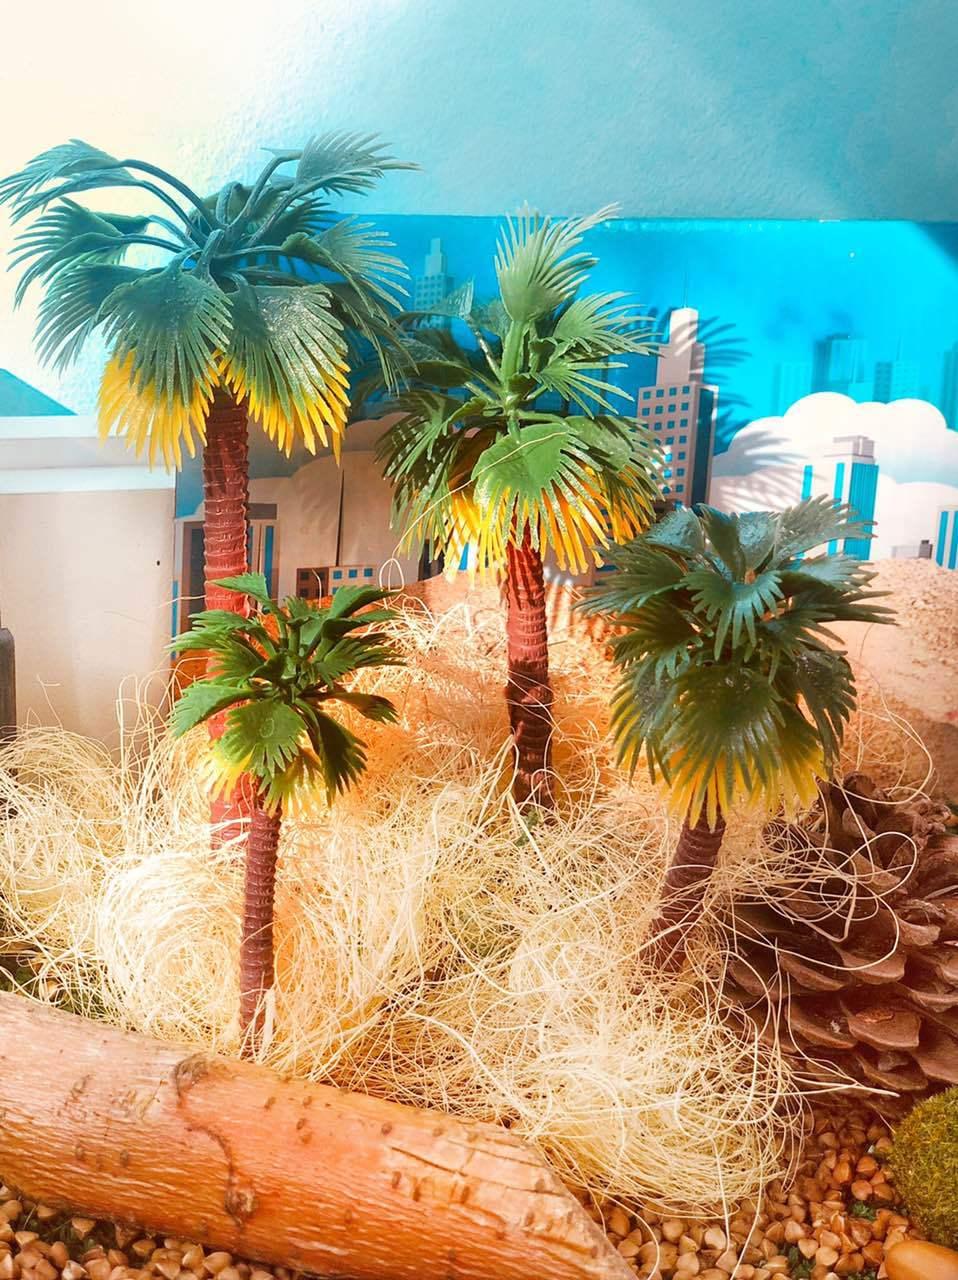 Пальма для сенсорных коробок